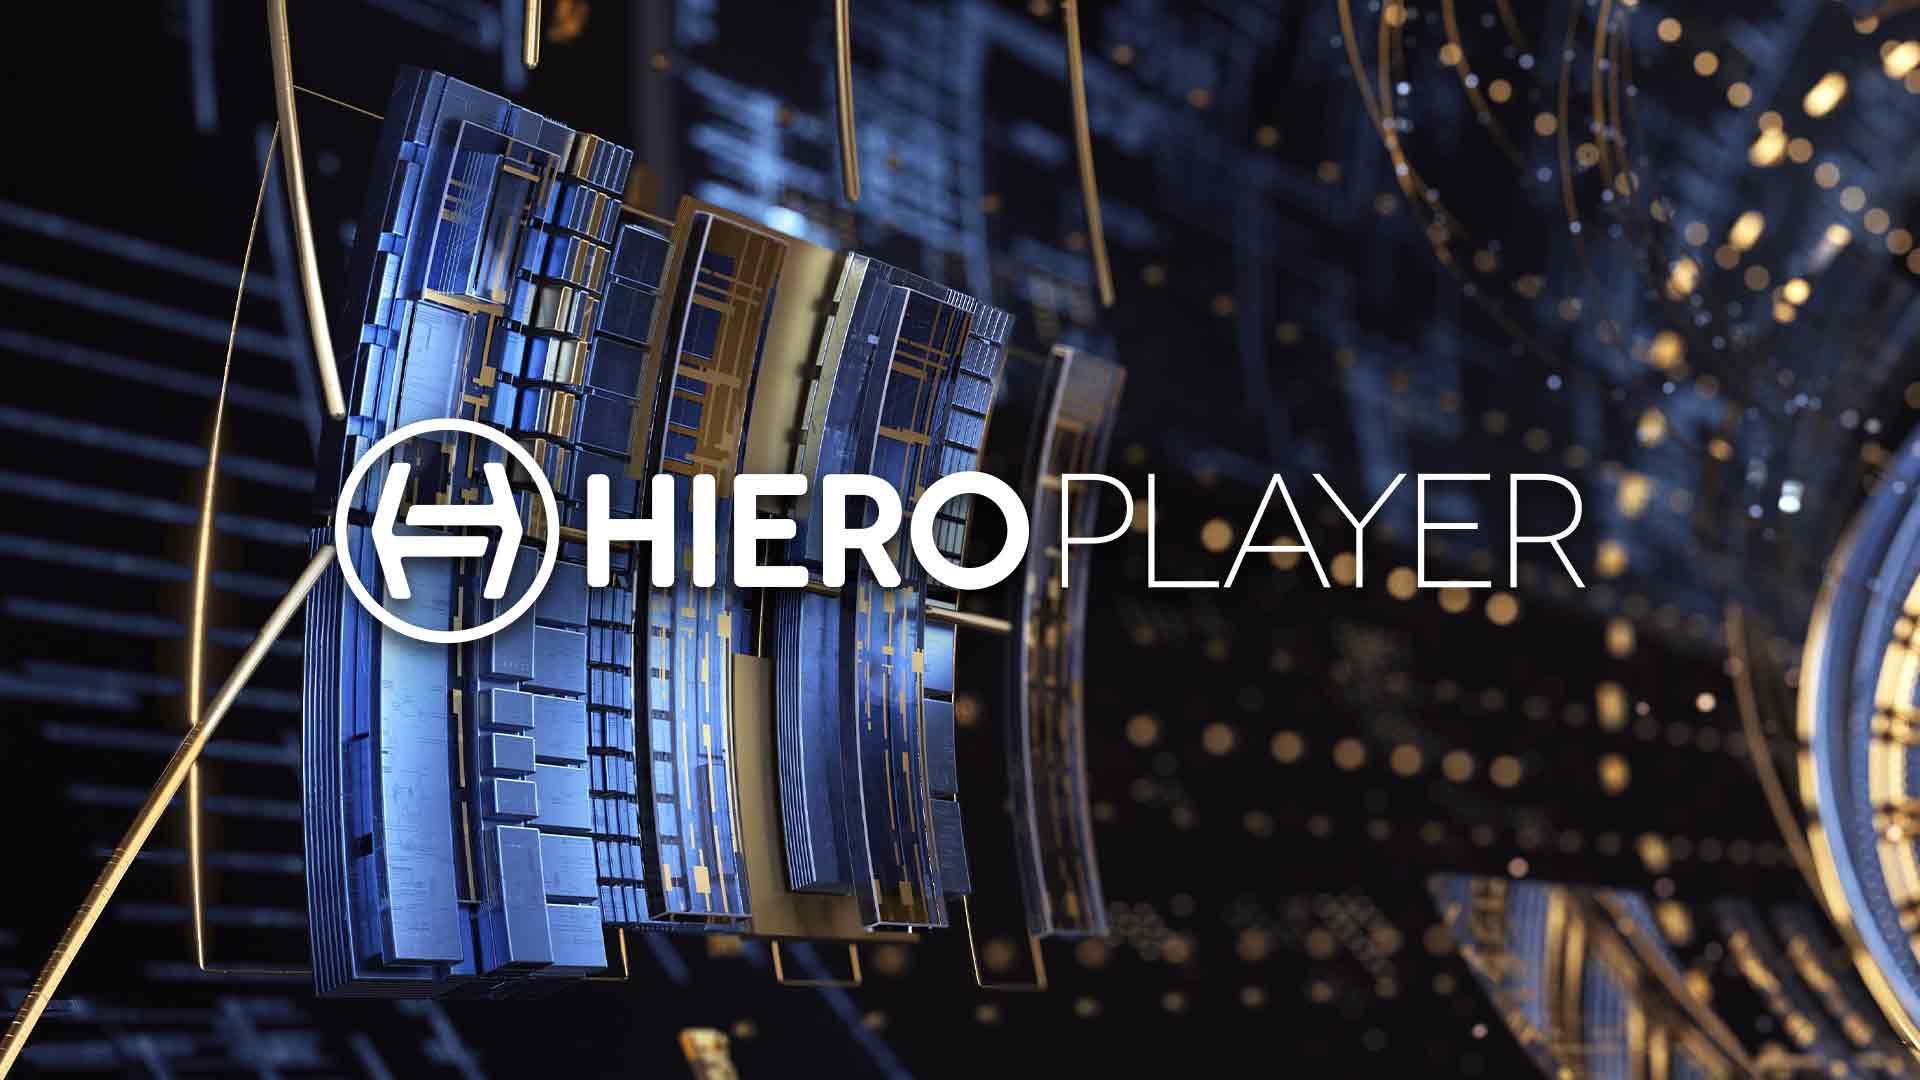 HieroPlayer free with nuke